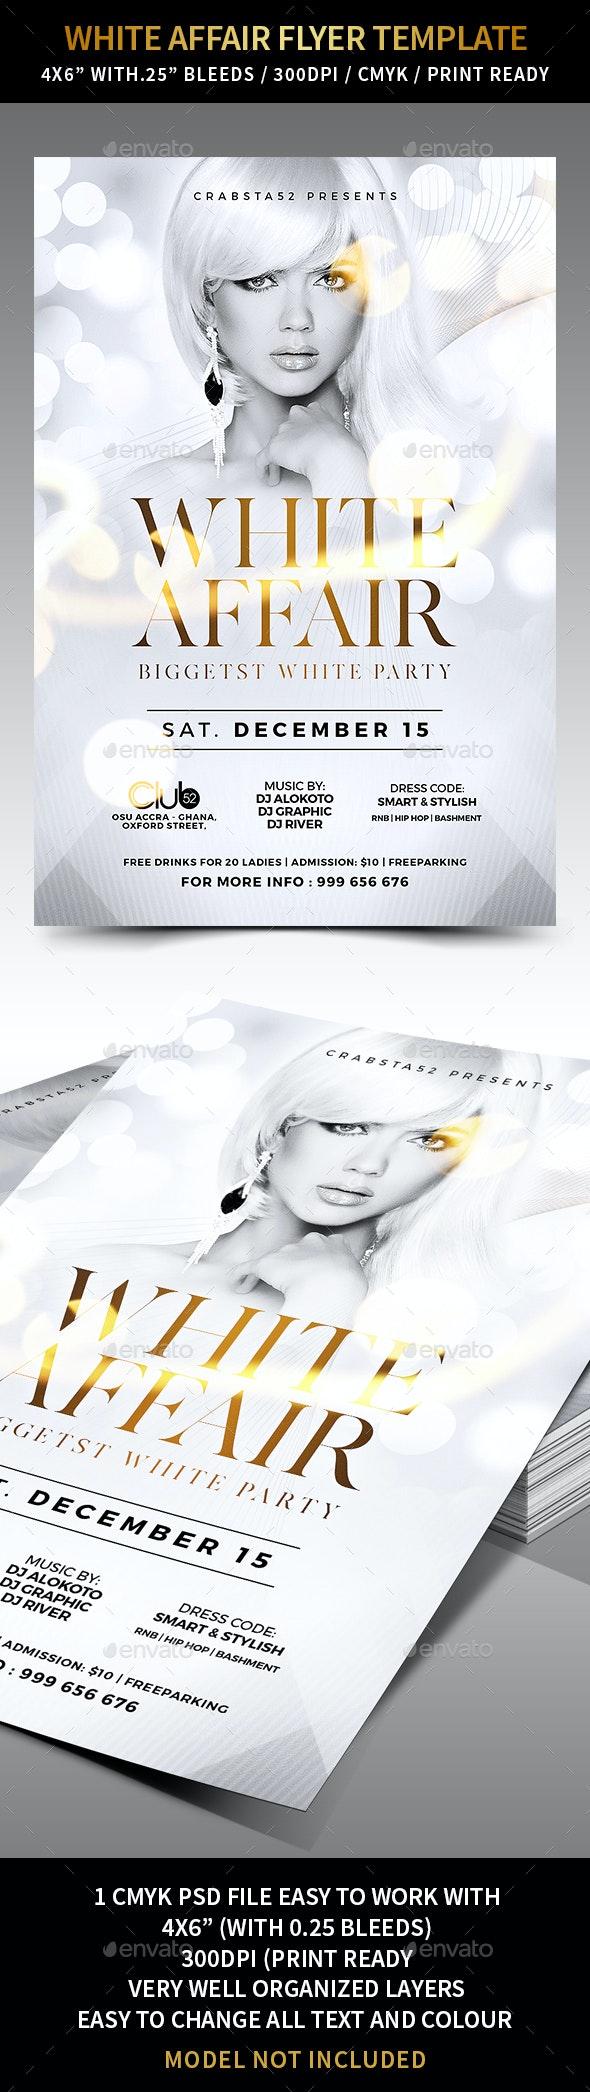 White Affair Flyer Template - Flyers Print Templates